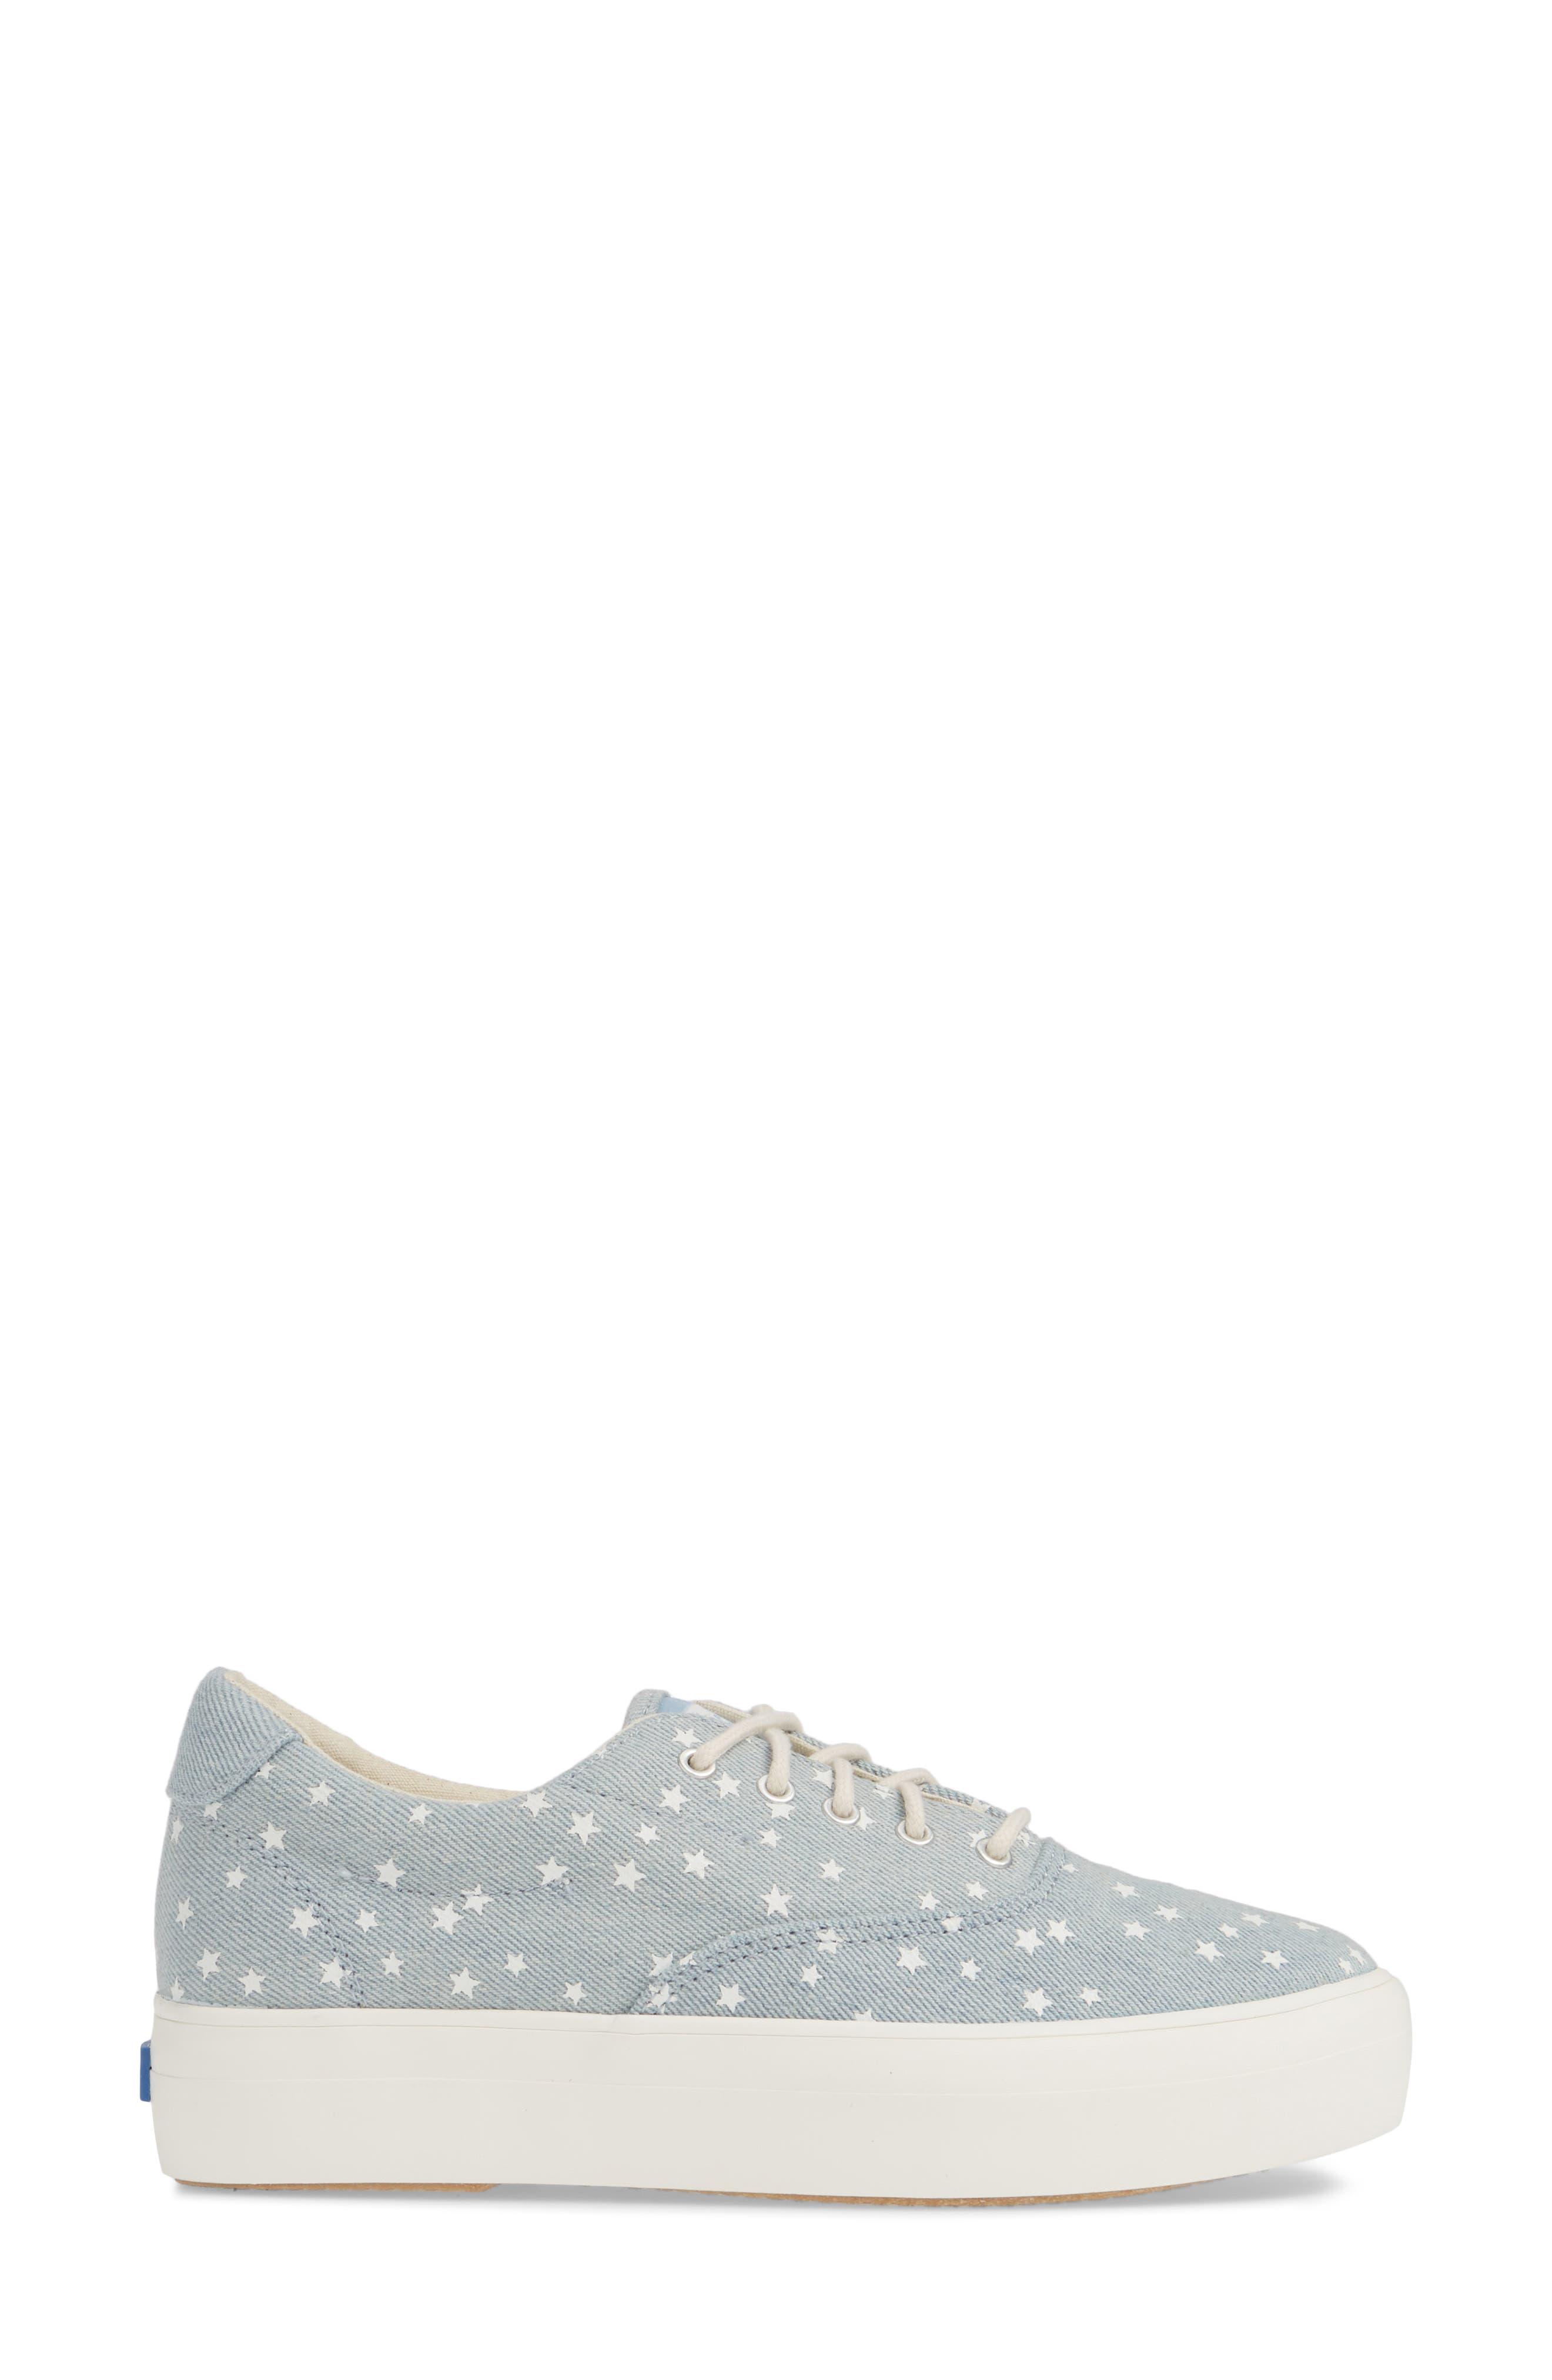 KEDS<SUP>®</SUP>, Rise Denim Star Sneaker, Alternate thumbnail 3, color, LIGHT BLUE